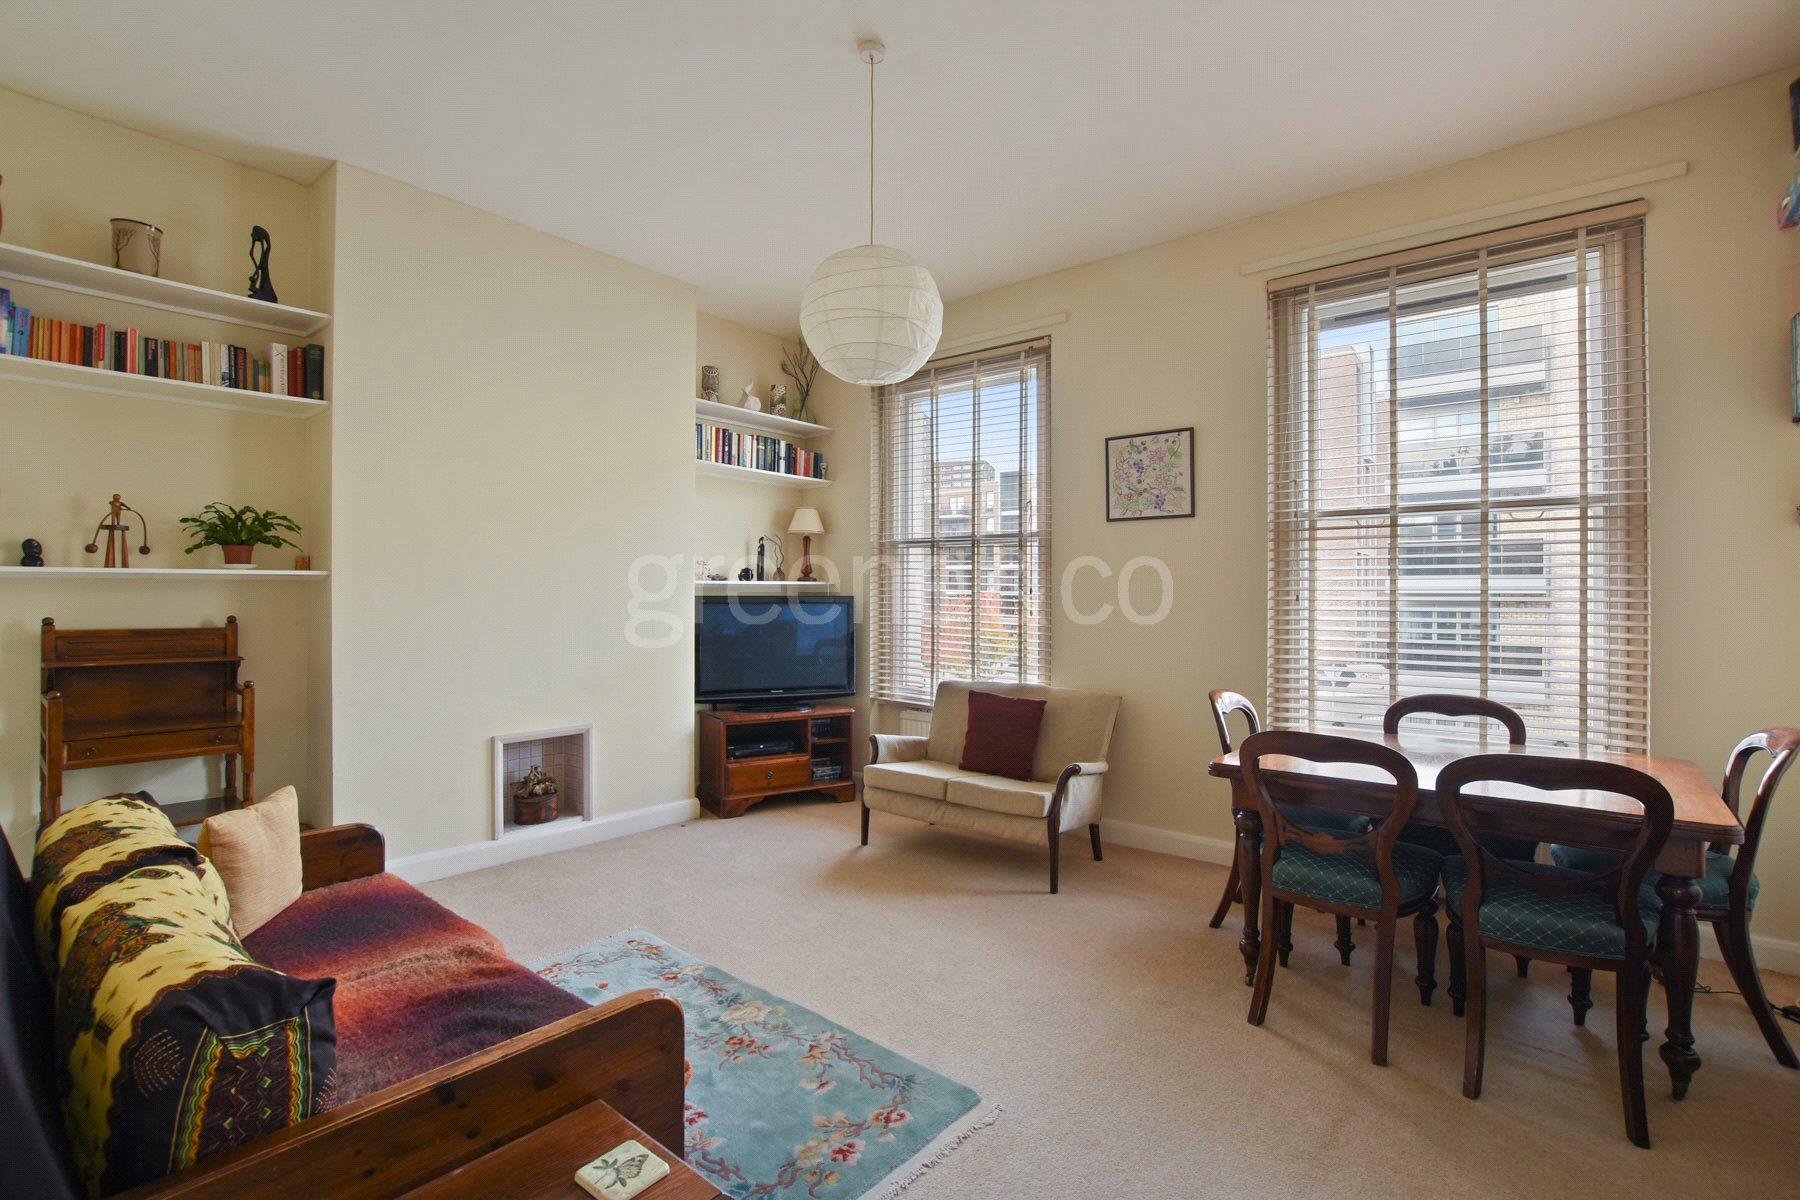 3 Bedrooms Flat for sale in Kilburn Park Road, Kilburn Park, London, NW6